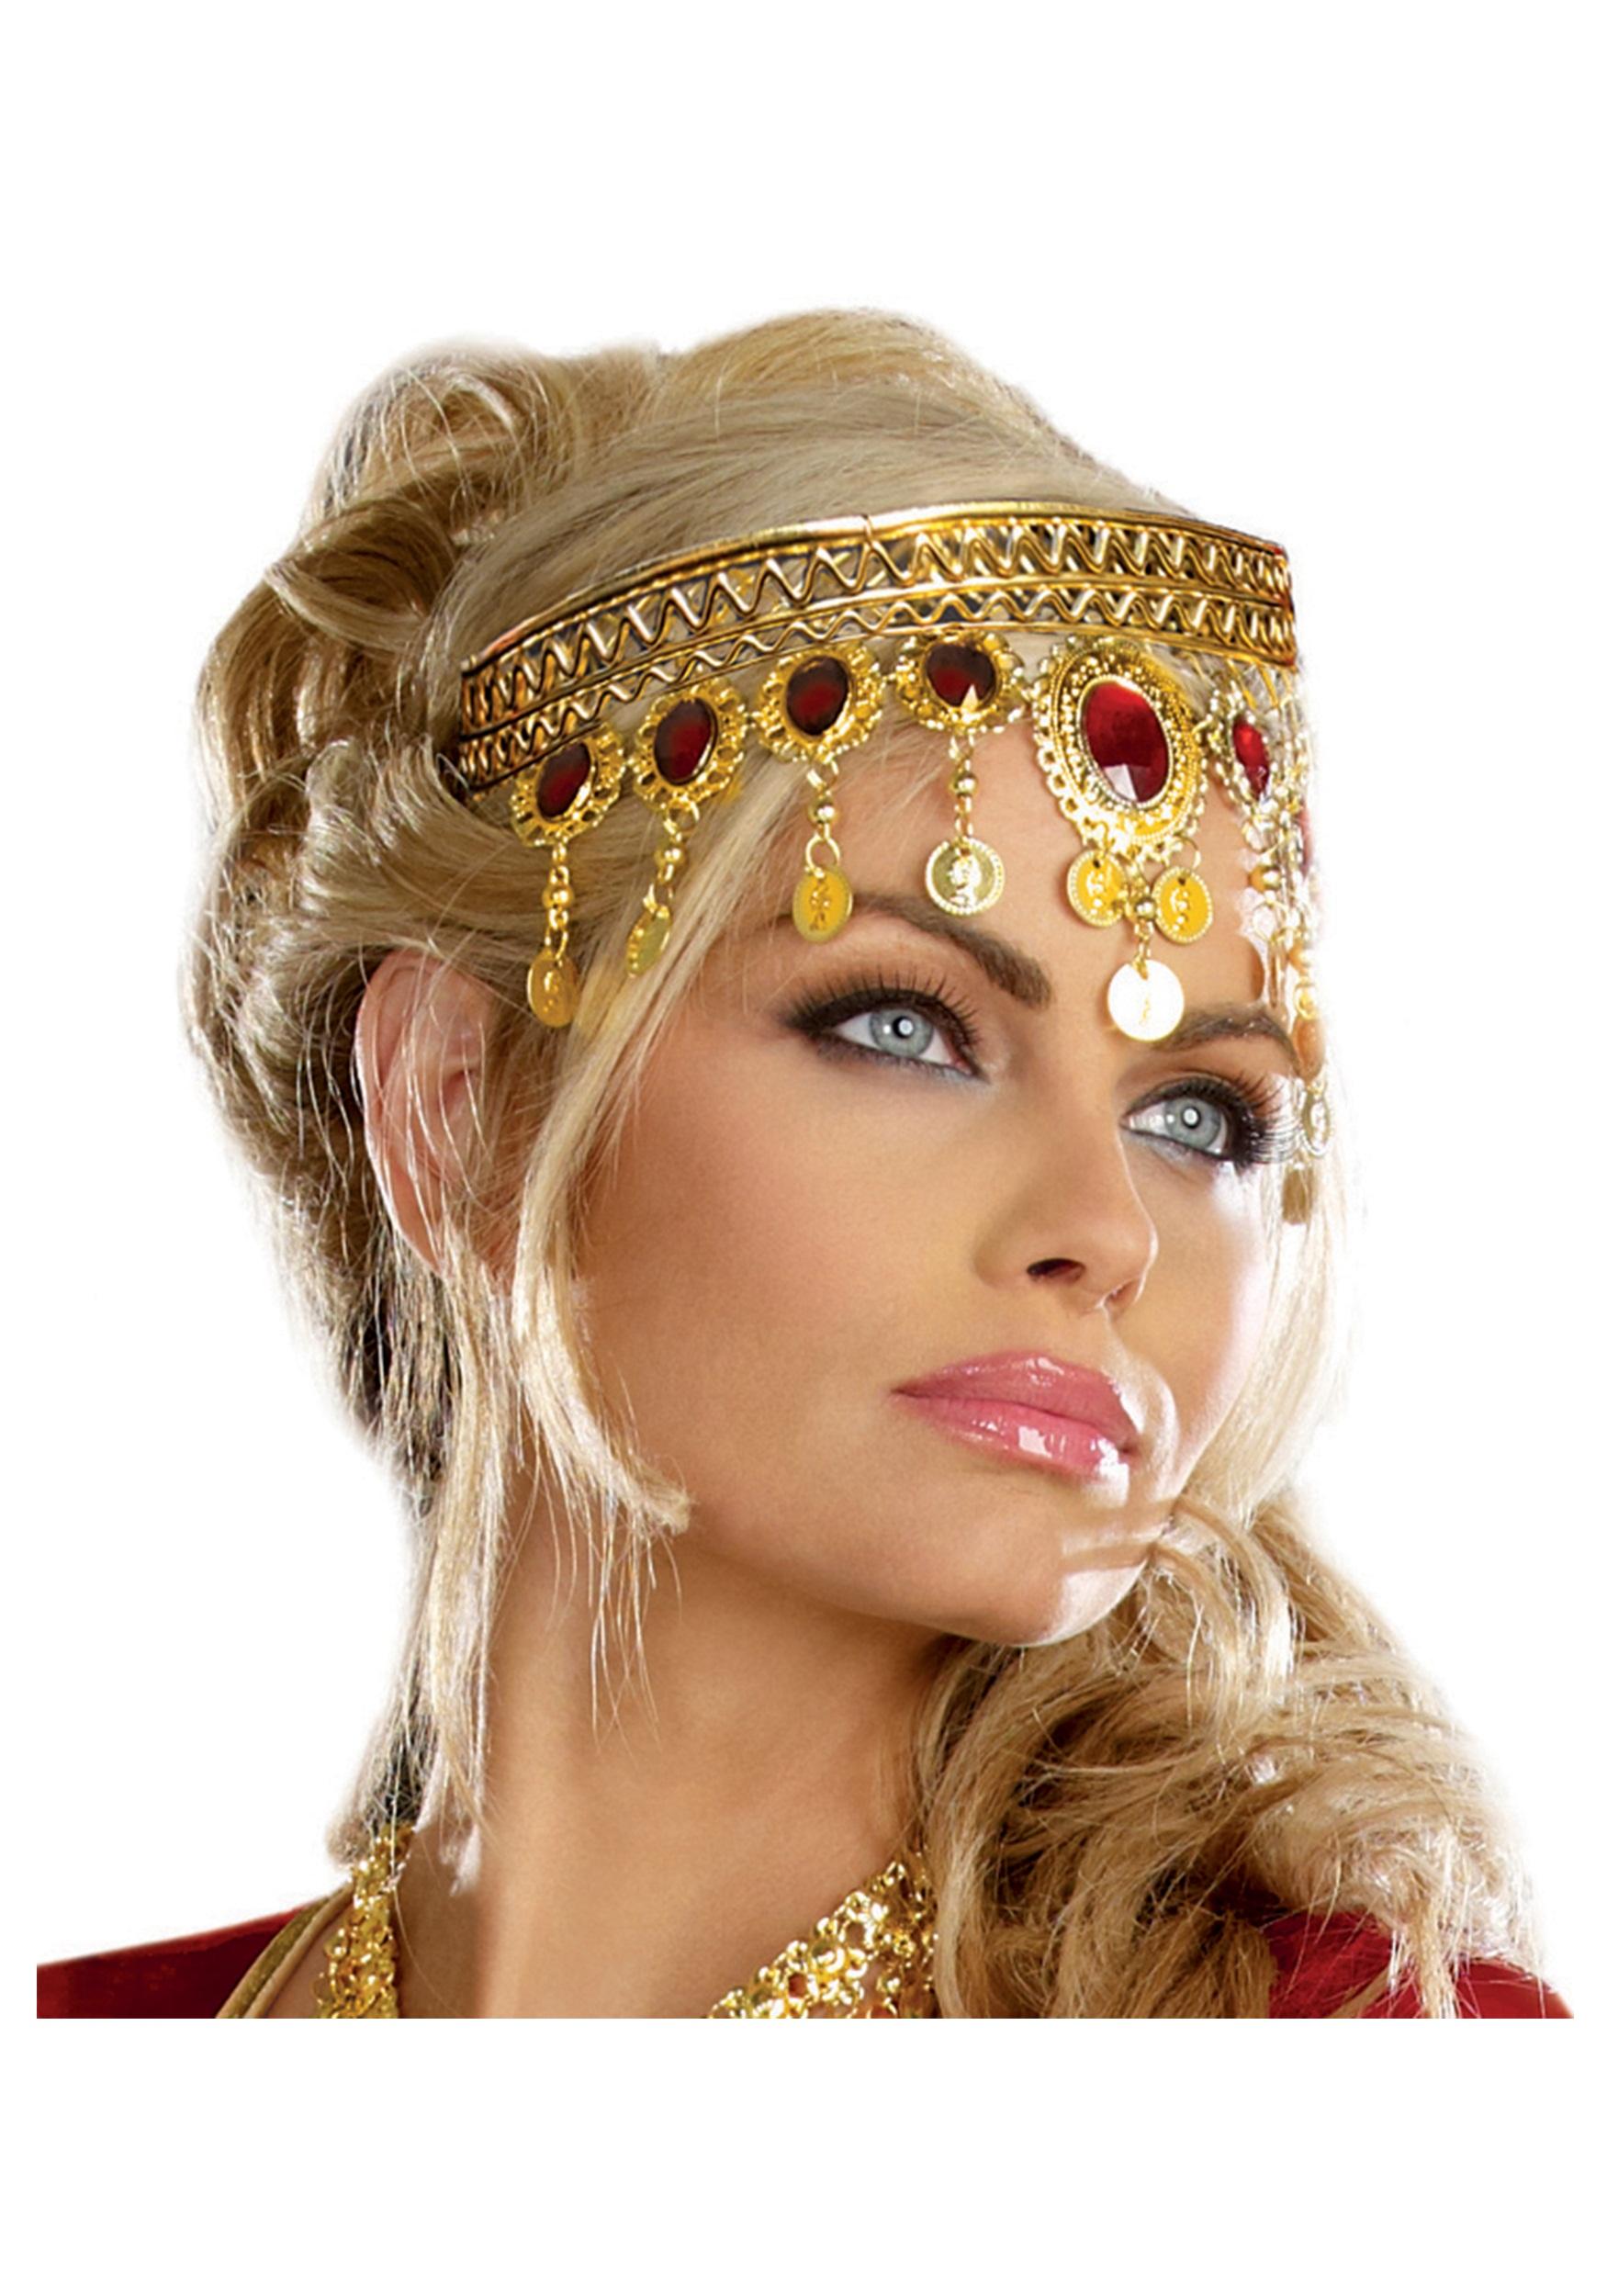 Women's Dripping Rubies Headpiece